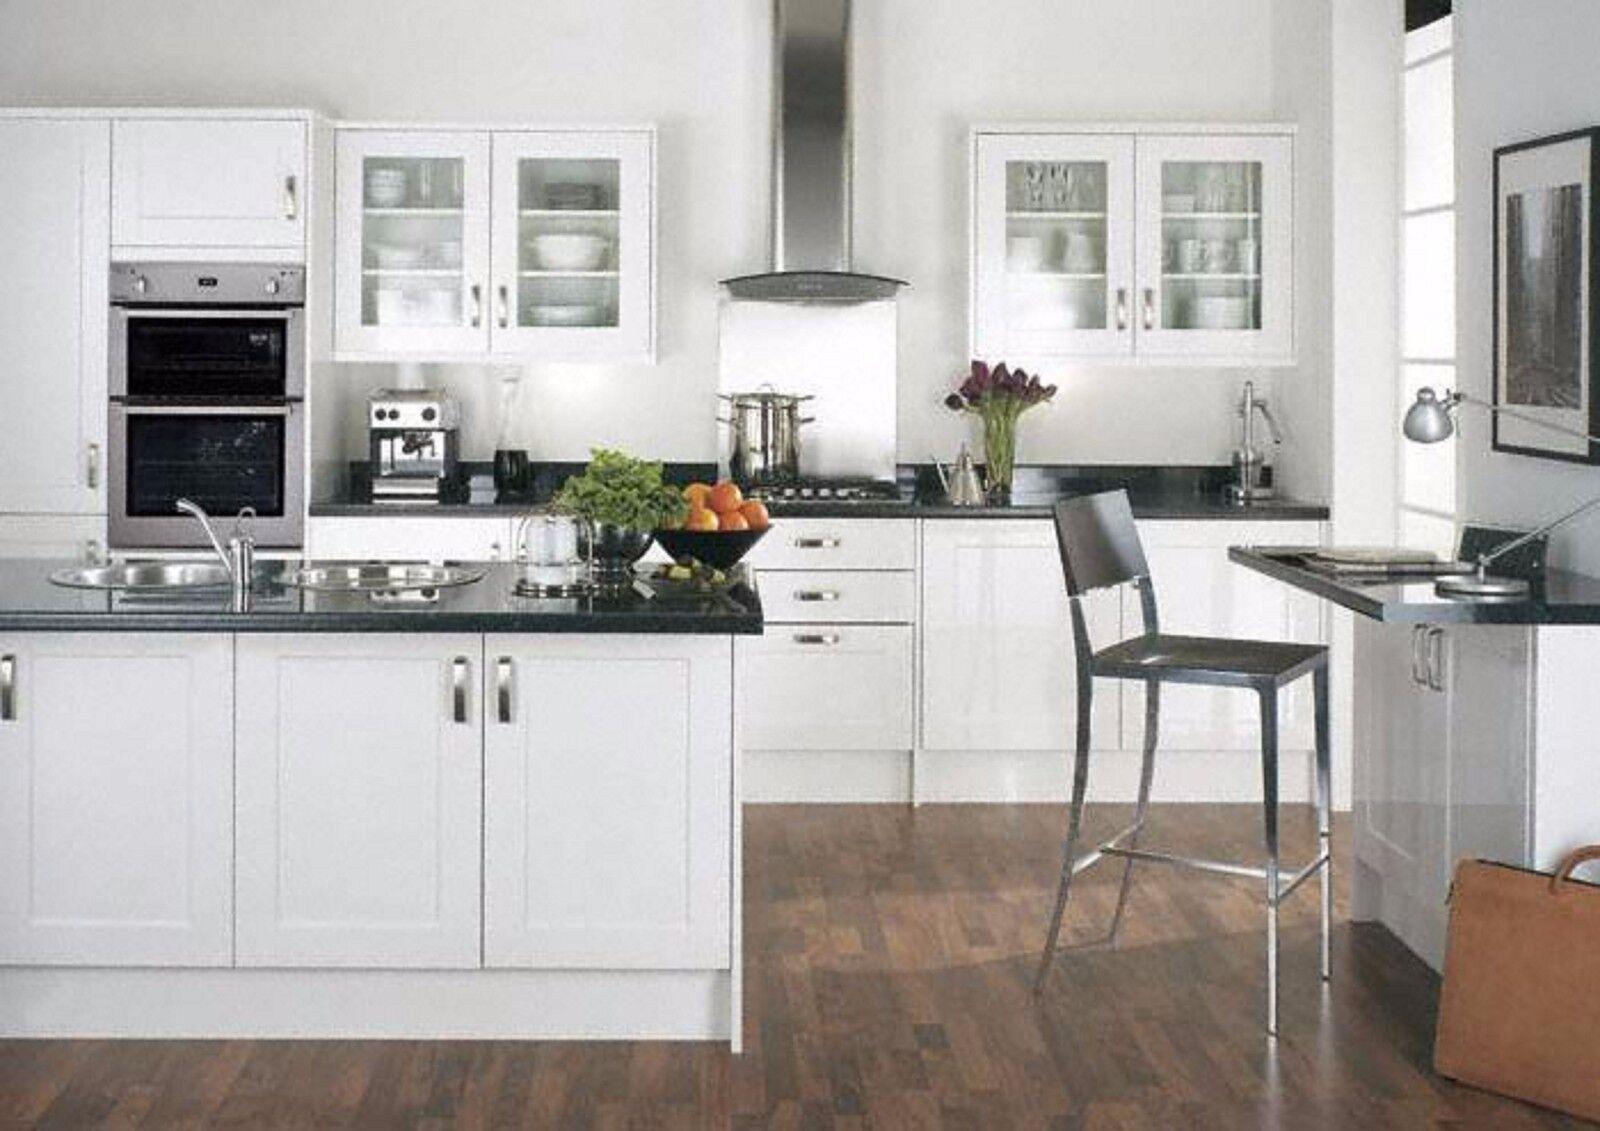 fp p gloss white shaker kitchen cabinet cupboard doors fit. Black Bedroom Furniture Sets. Home Design Ideas